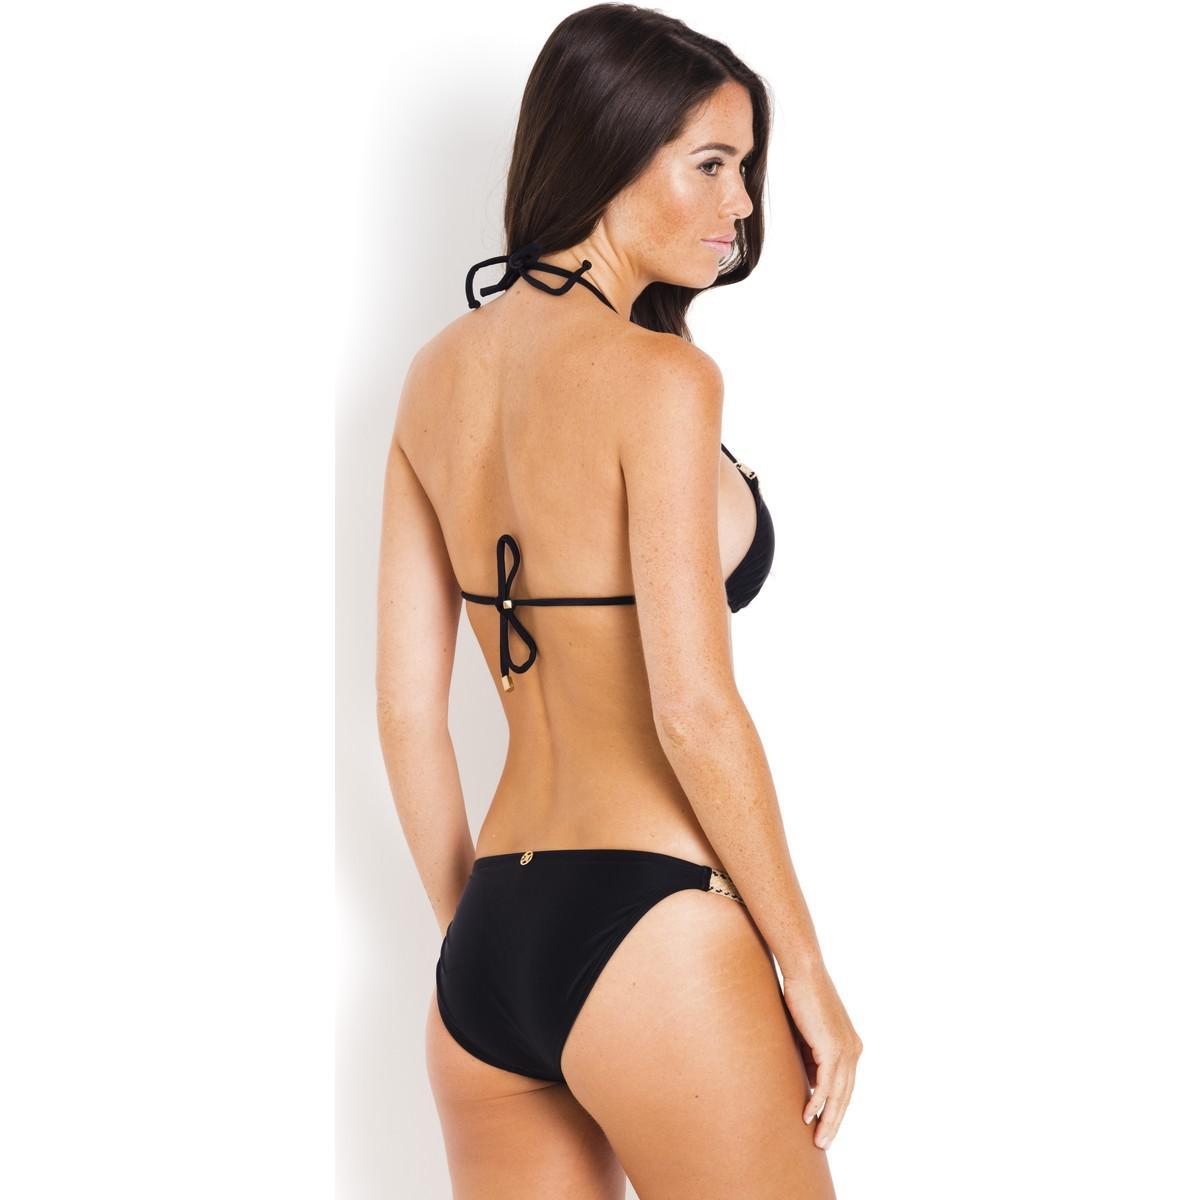 Professional For Sale Clearance Online Cheap Real Slim Ibiza Jute VIX PaulaHermanny Black Bikini top on the shoulder straps VIX PAULAHERMANNY 0G8psY3mx